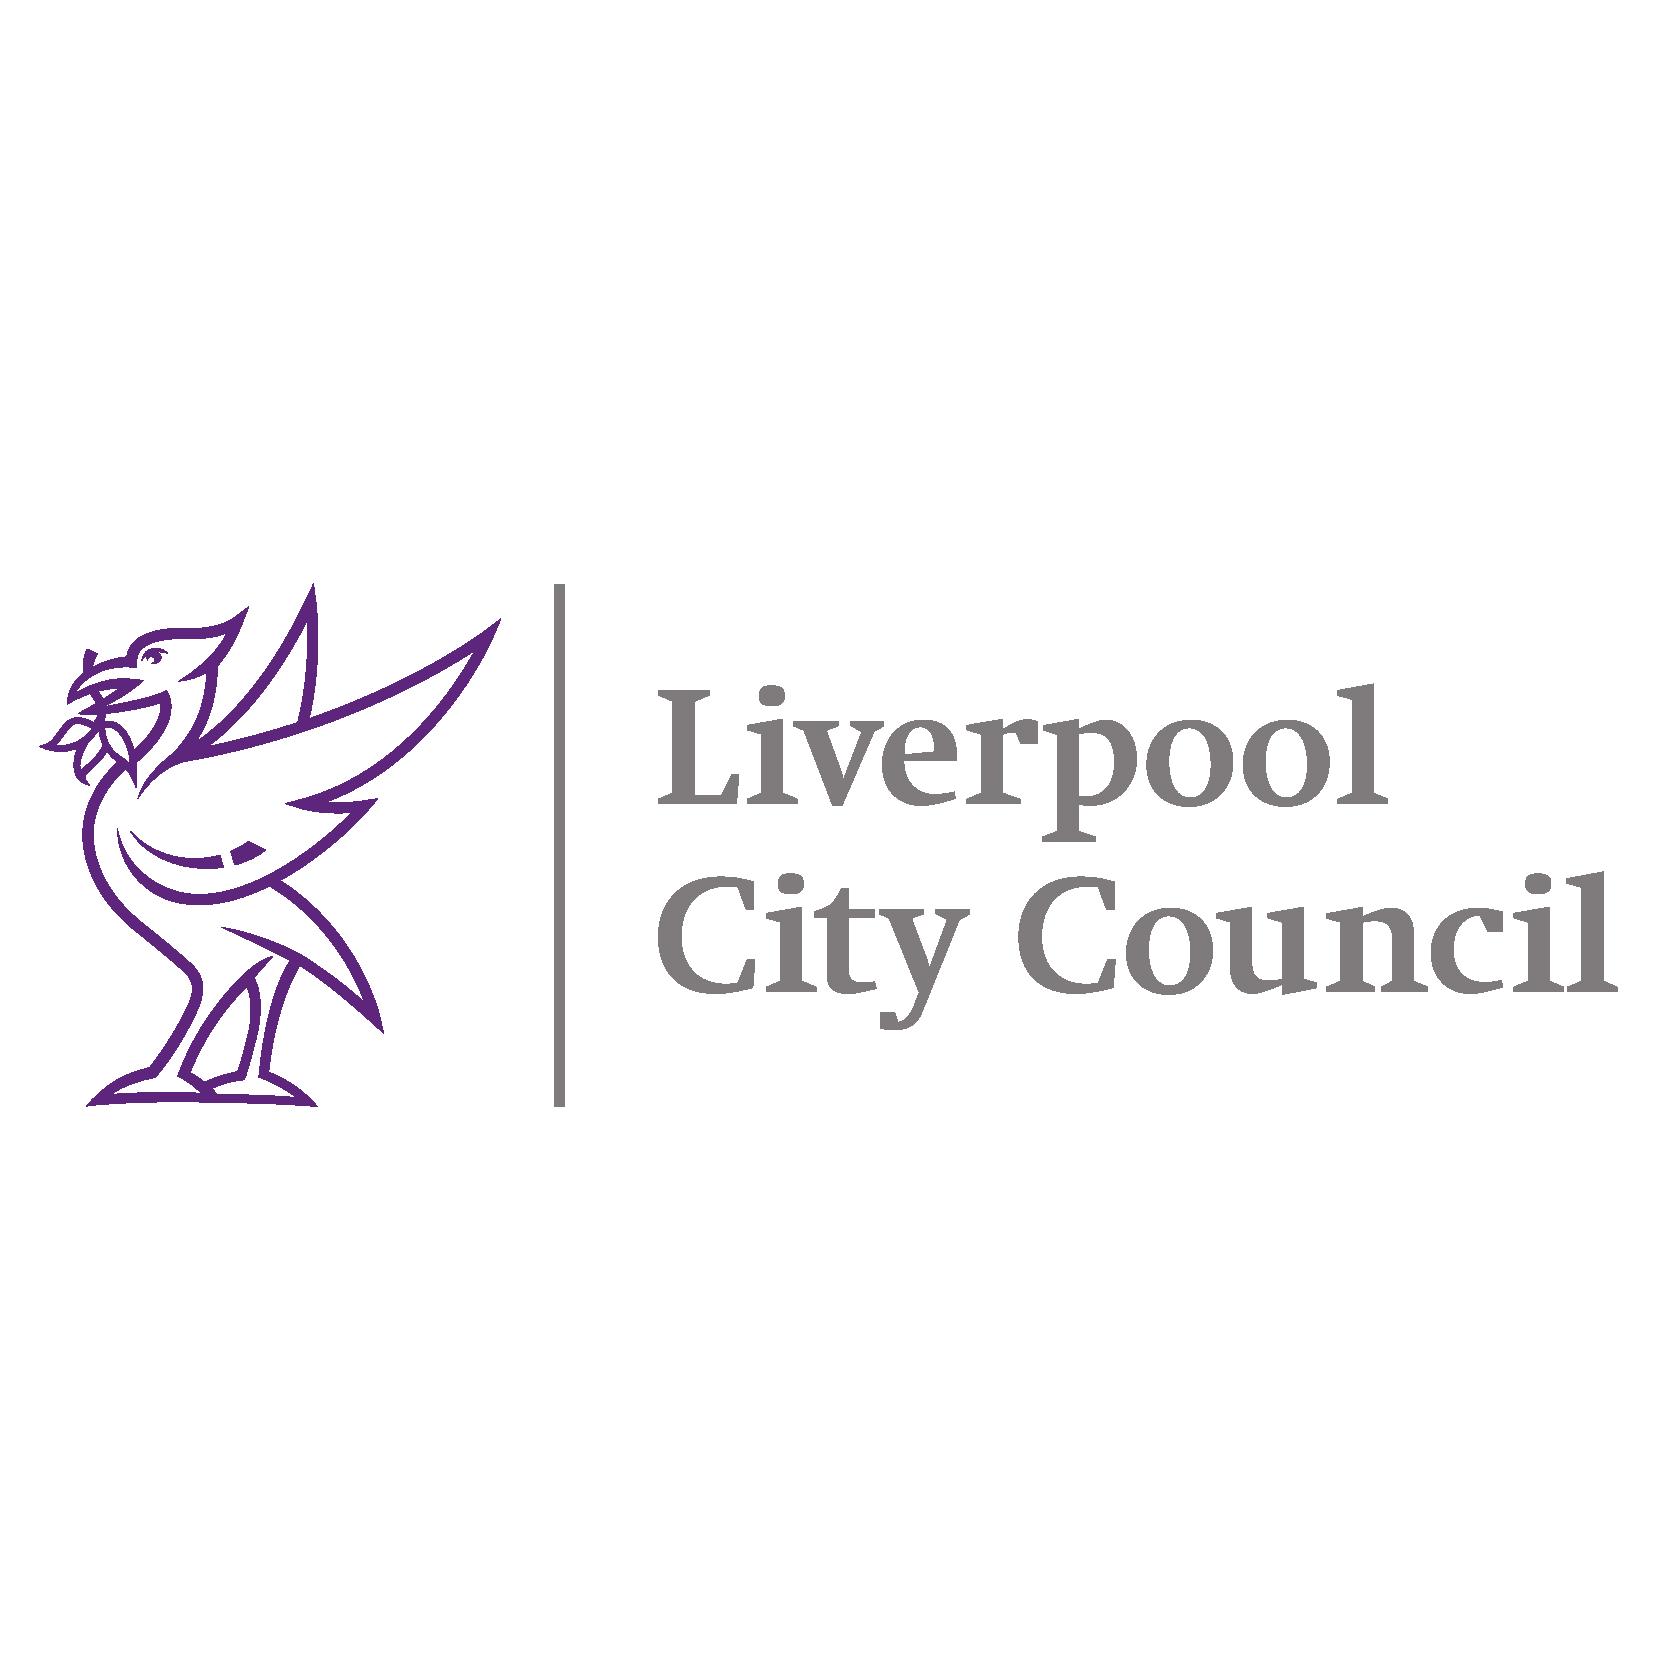 Liverpool City Council u2022 Government u2022 UK - Liverpool City Council PNG